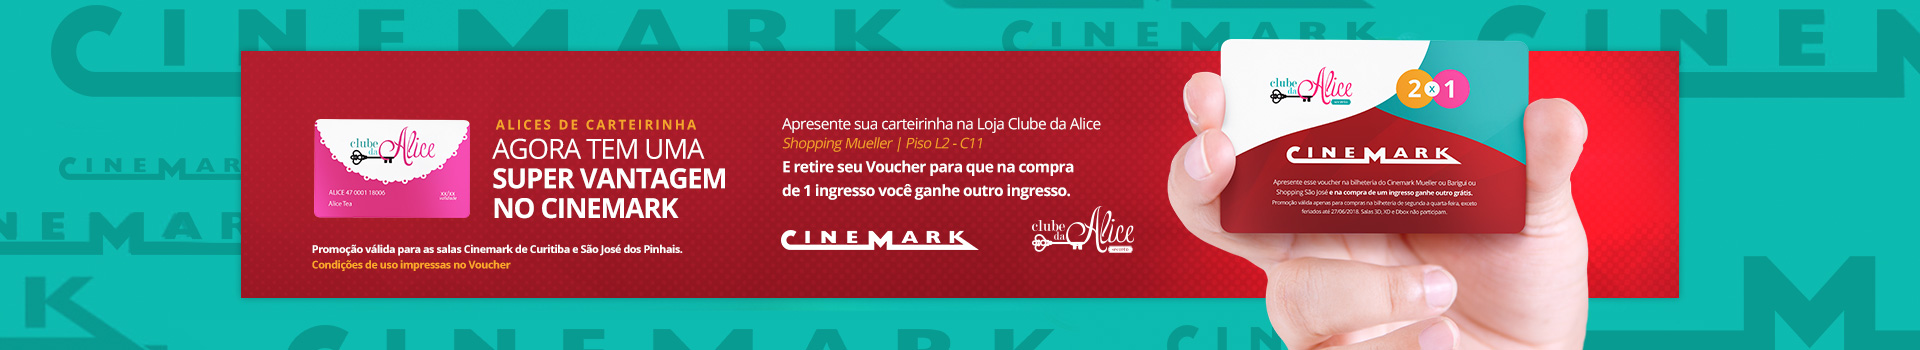 Cinemark 1